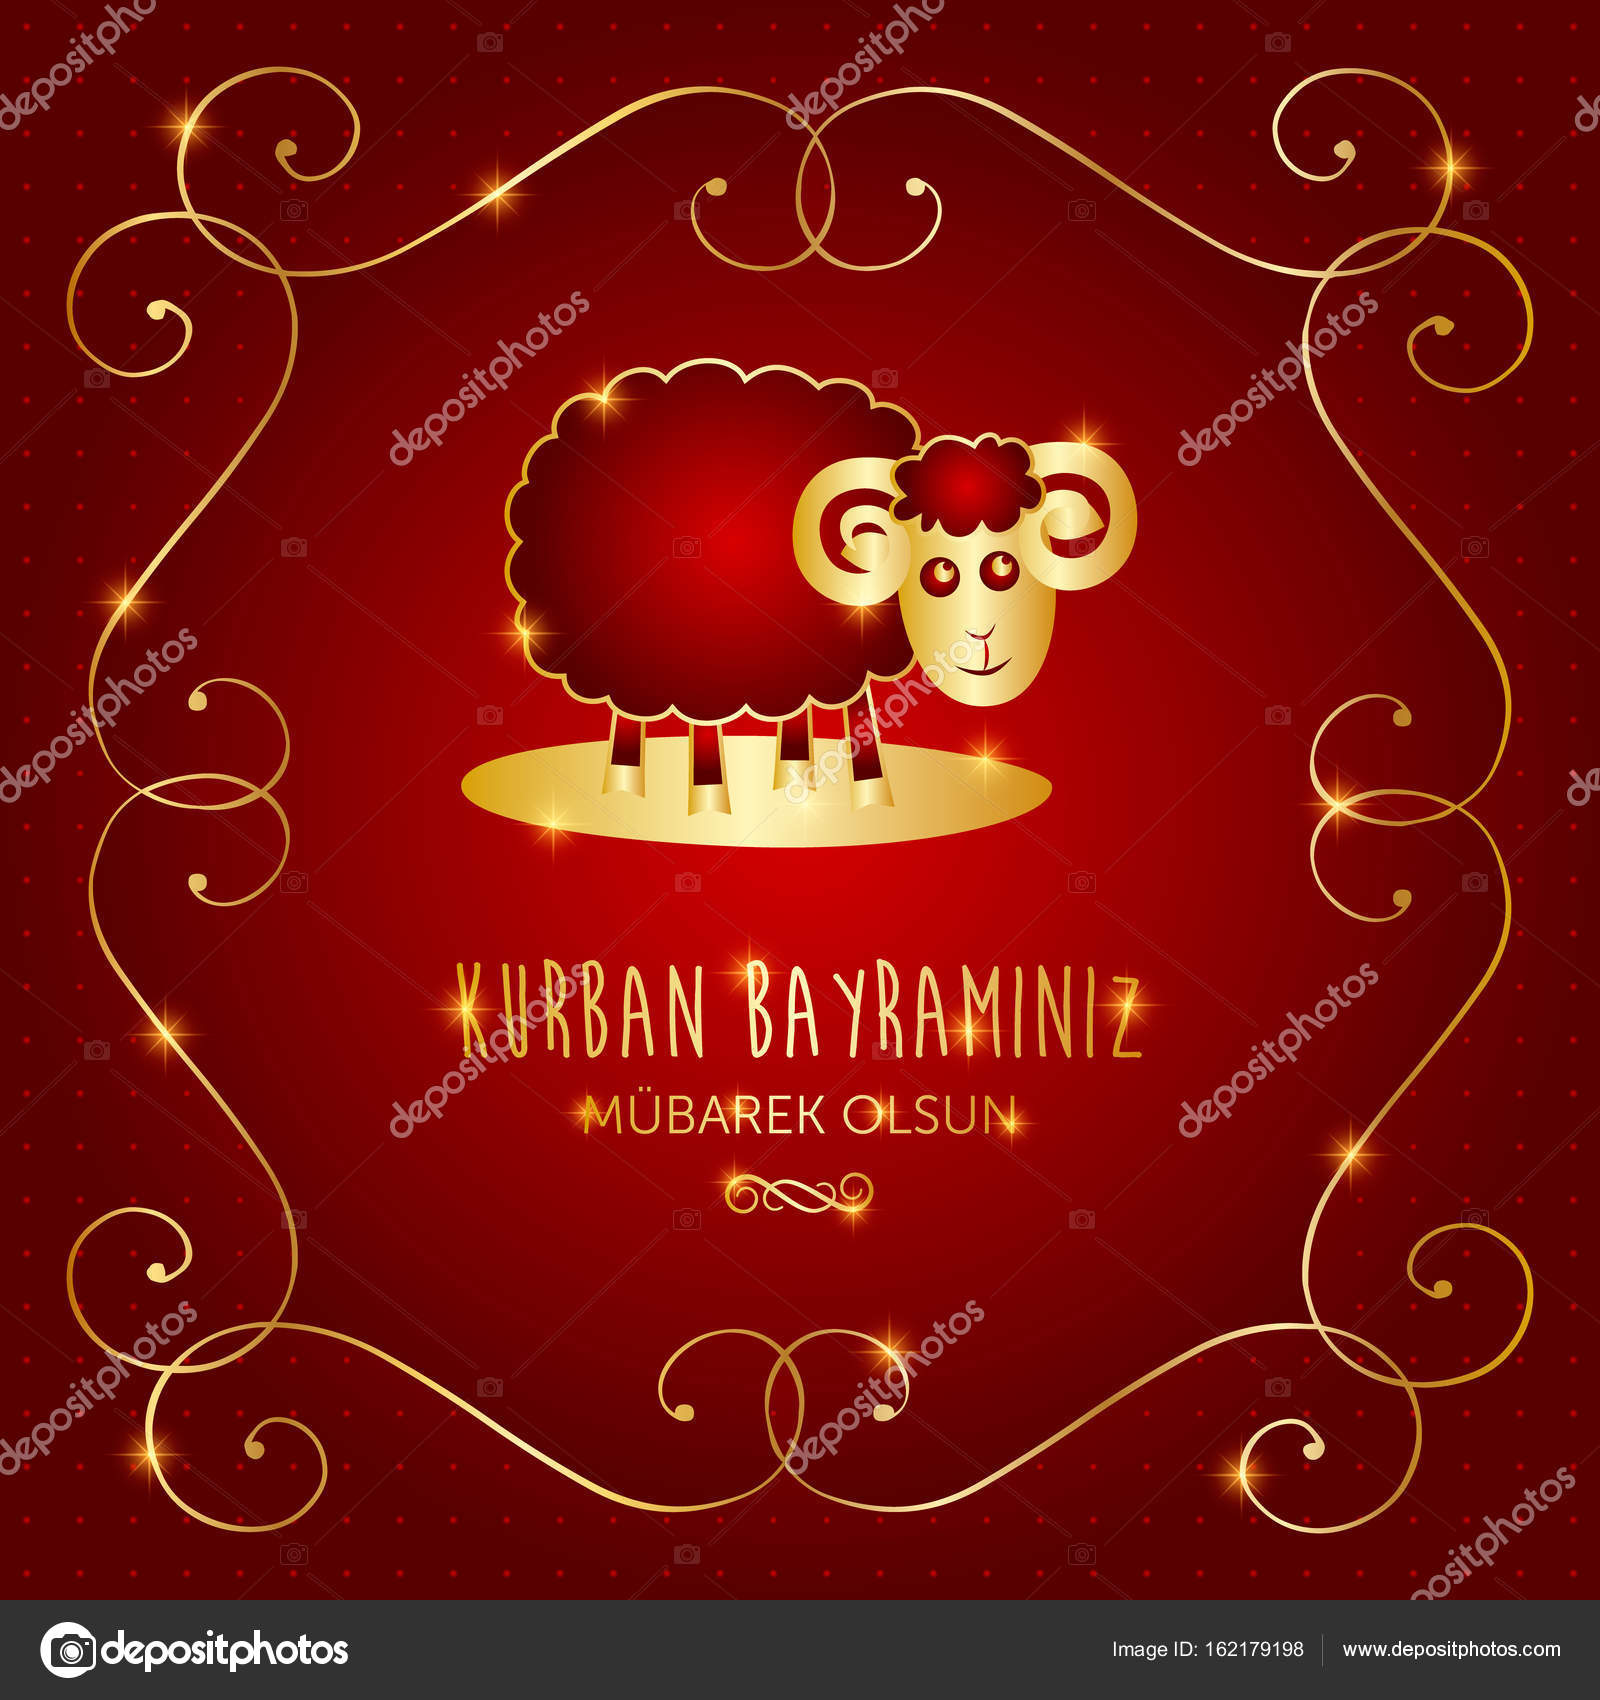 Kurban Bayrami Islamic Festival Of Sacrifice Eid Al Adha Mubarak